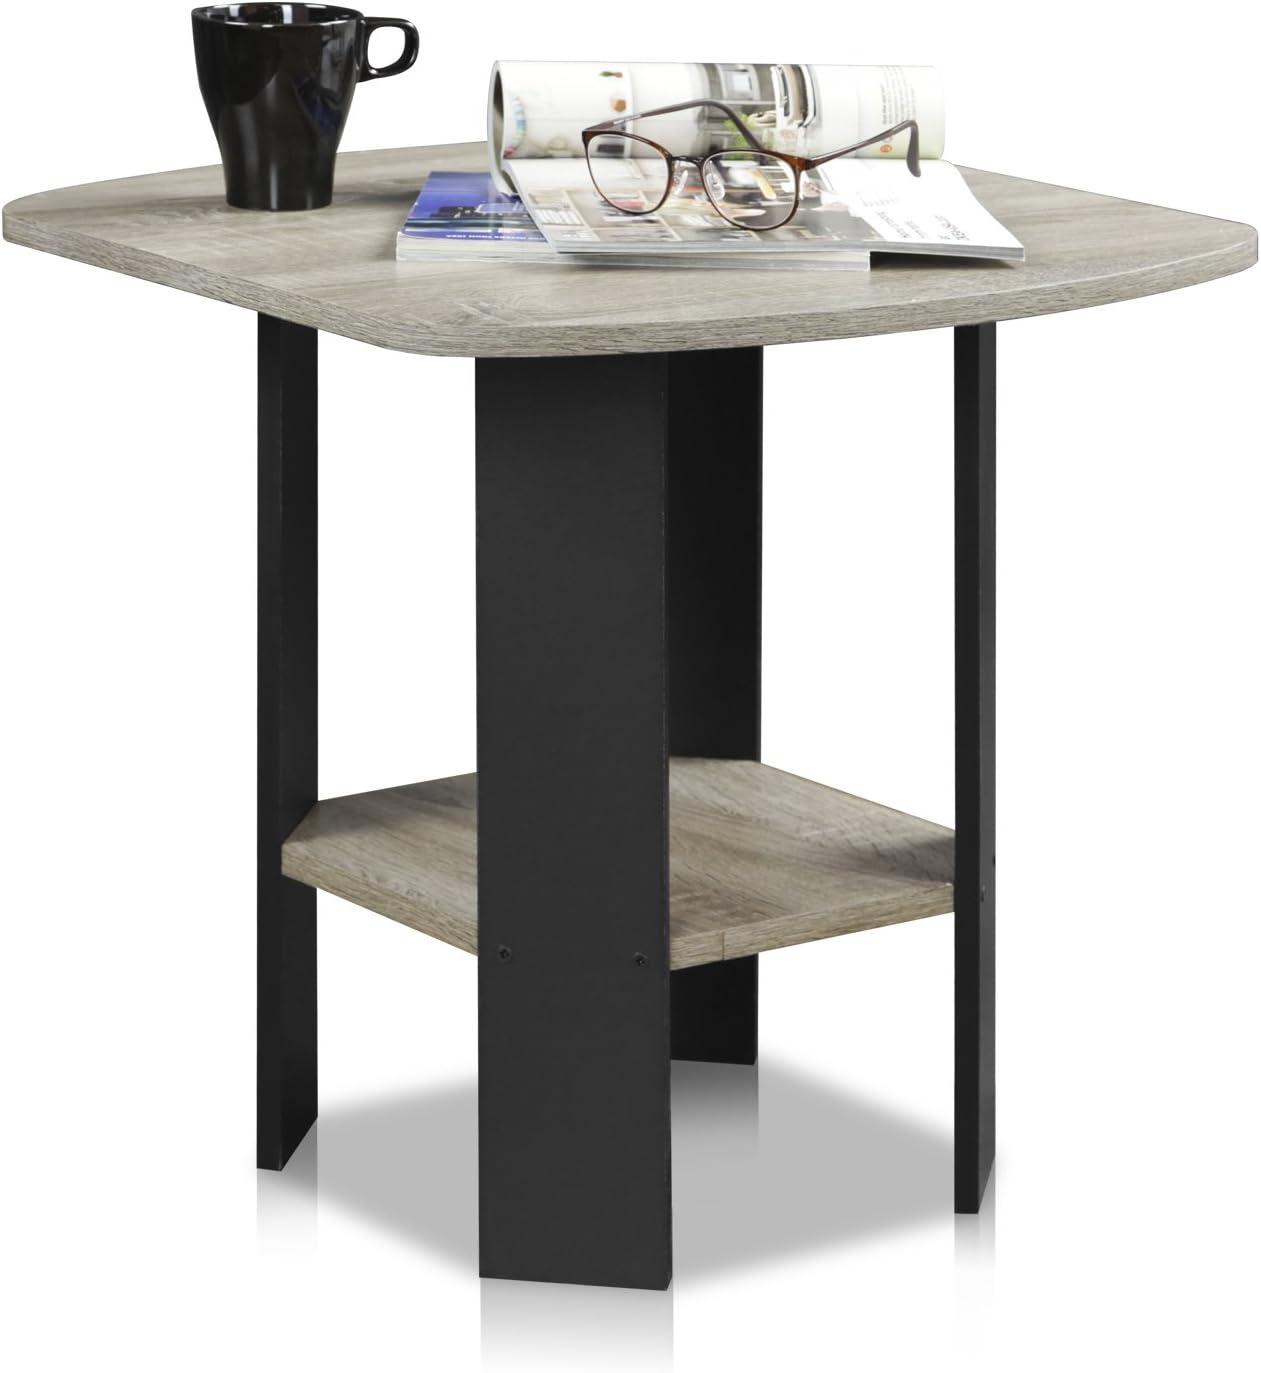 FURINNO Simple Design End Table, 2-Pack, French Oak Grey/Black: Furniture & Decor